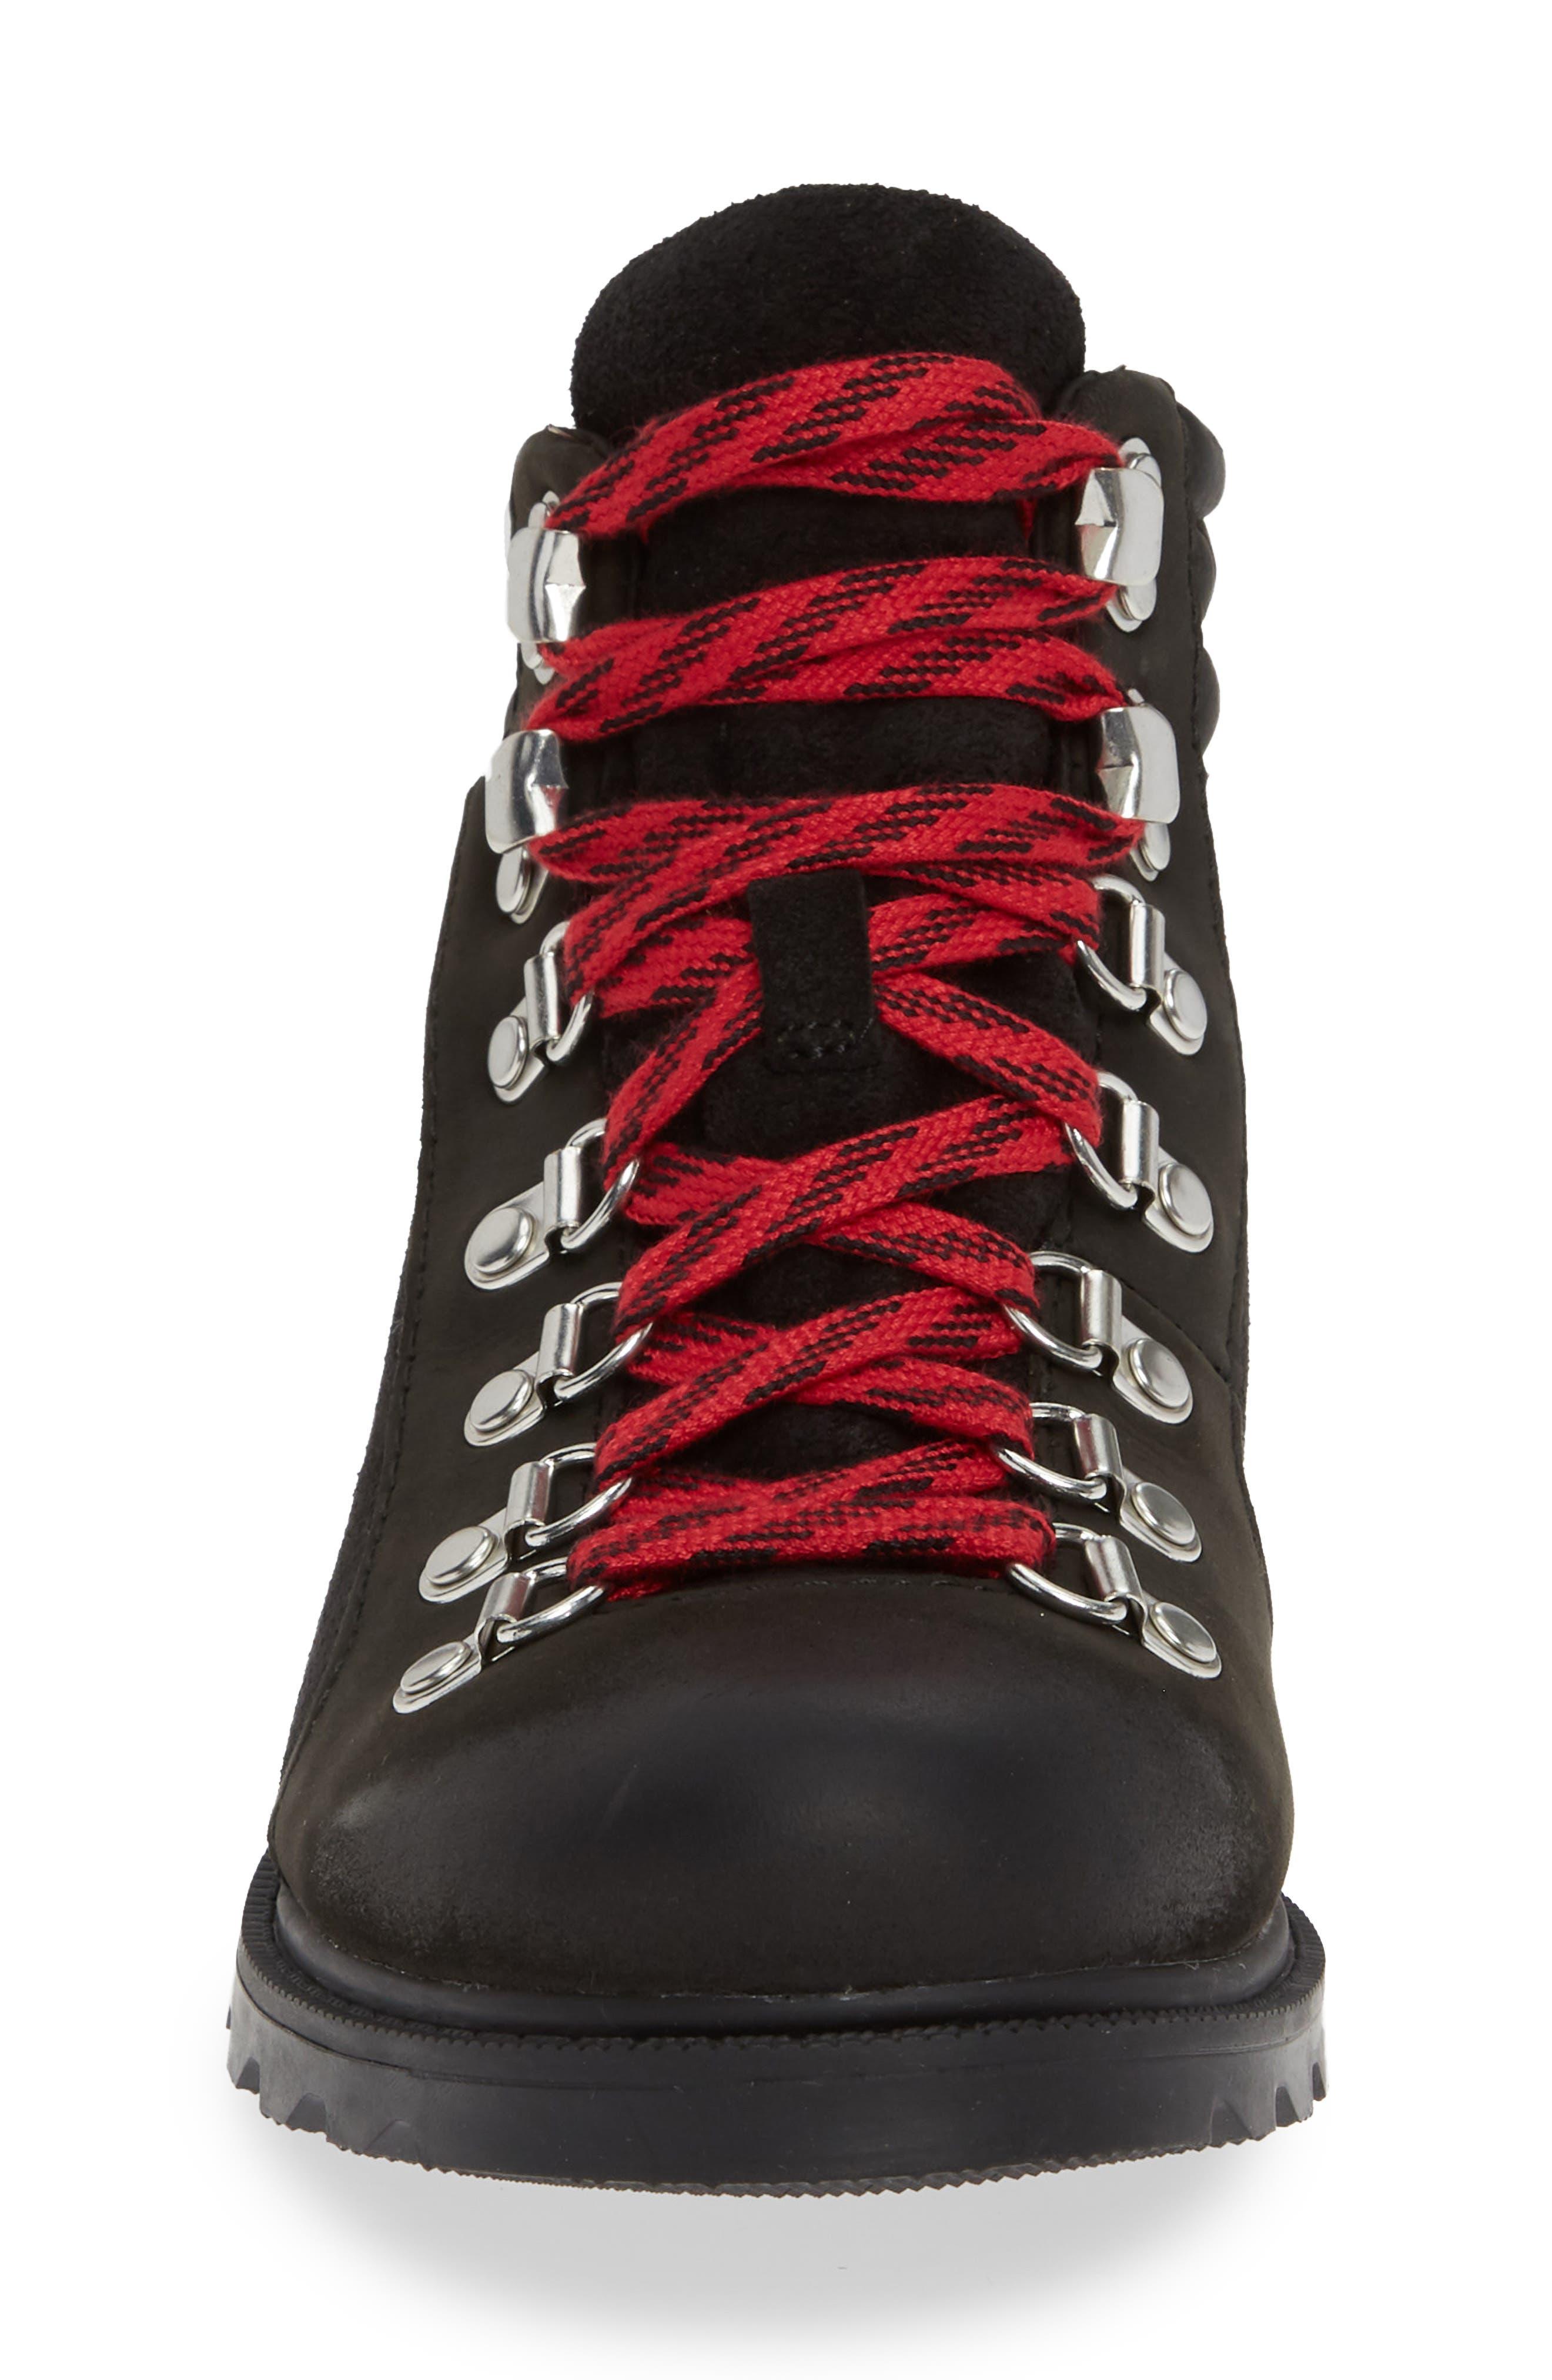 SOREL, Ainsley Conquest Waterproof Boot, Alternate thumbnail 4, color, BLACK/ BLACK